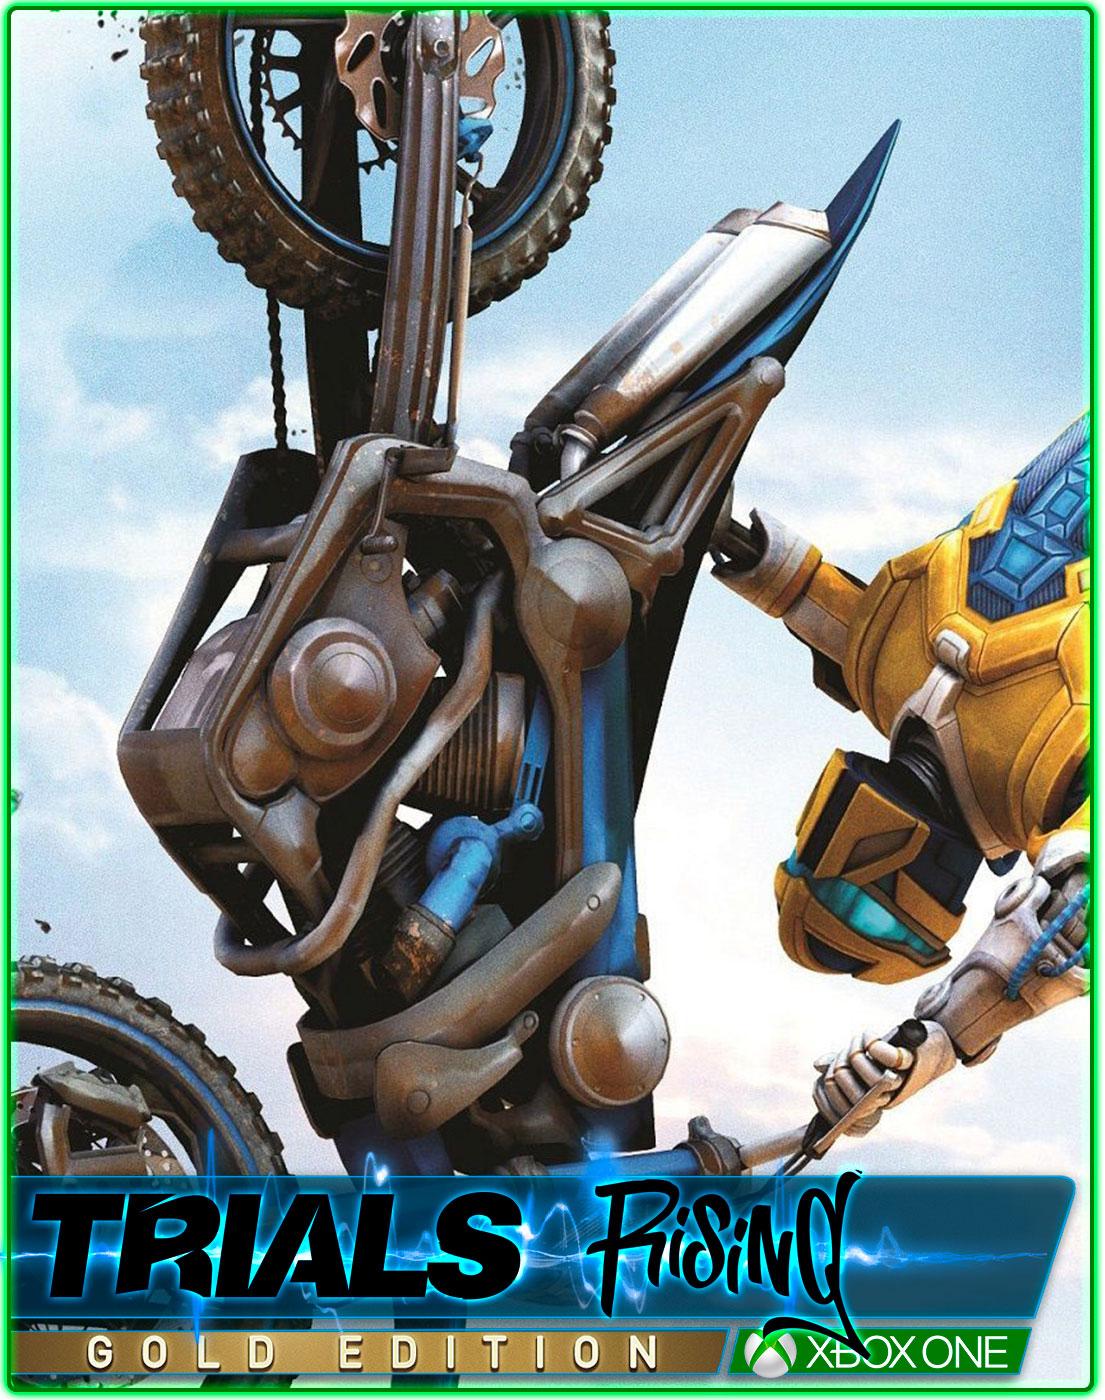 Trials Rising Digital Gold Edition(XBOX ONE) 2019